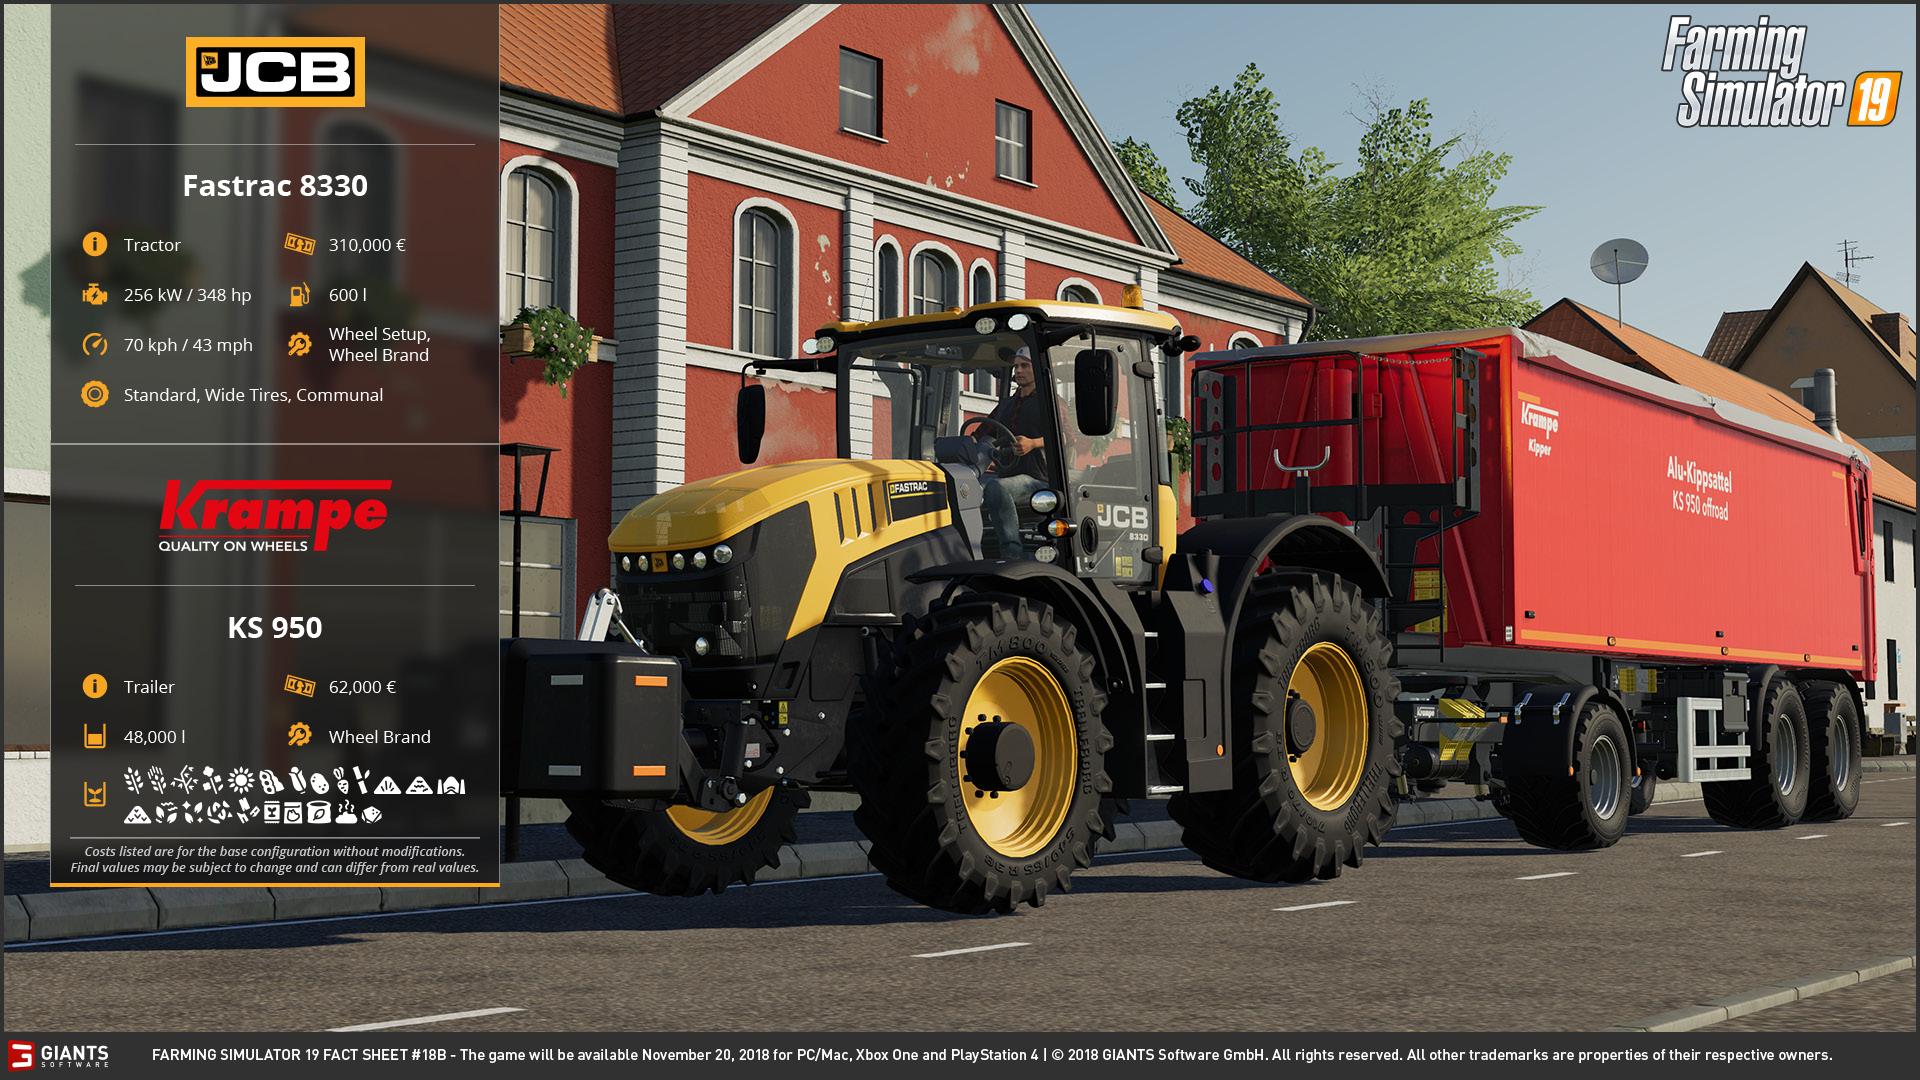 Farming Simulator 19: Fact Sheets #18, 19 & 20 | Scholarly Gamers